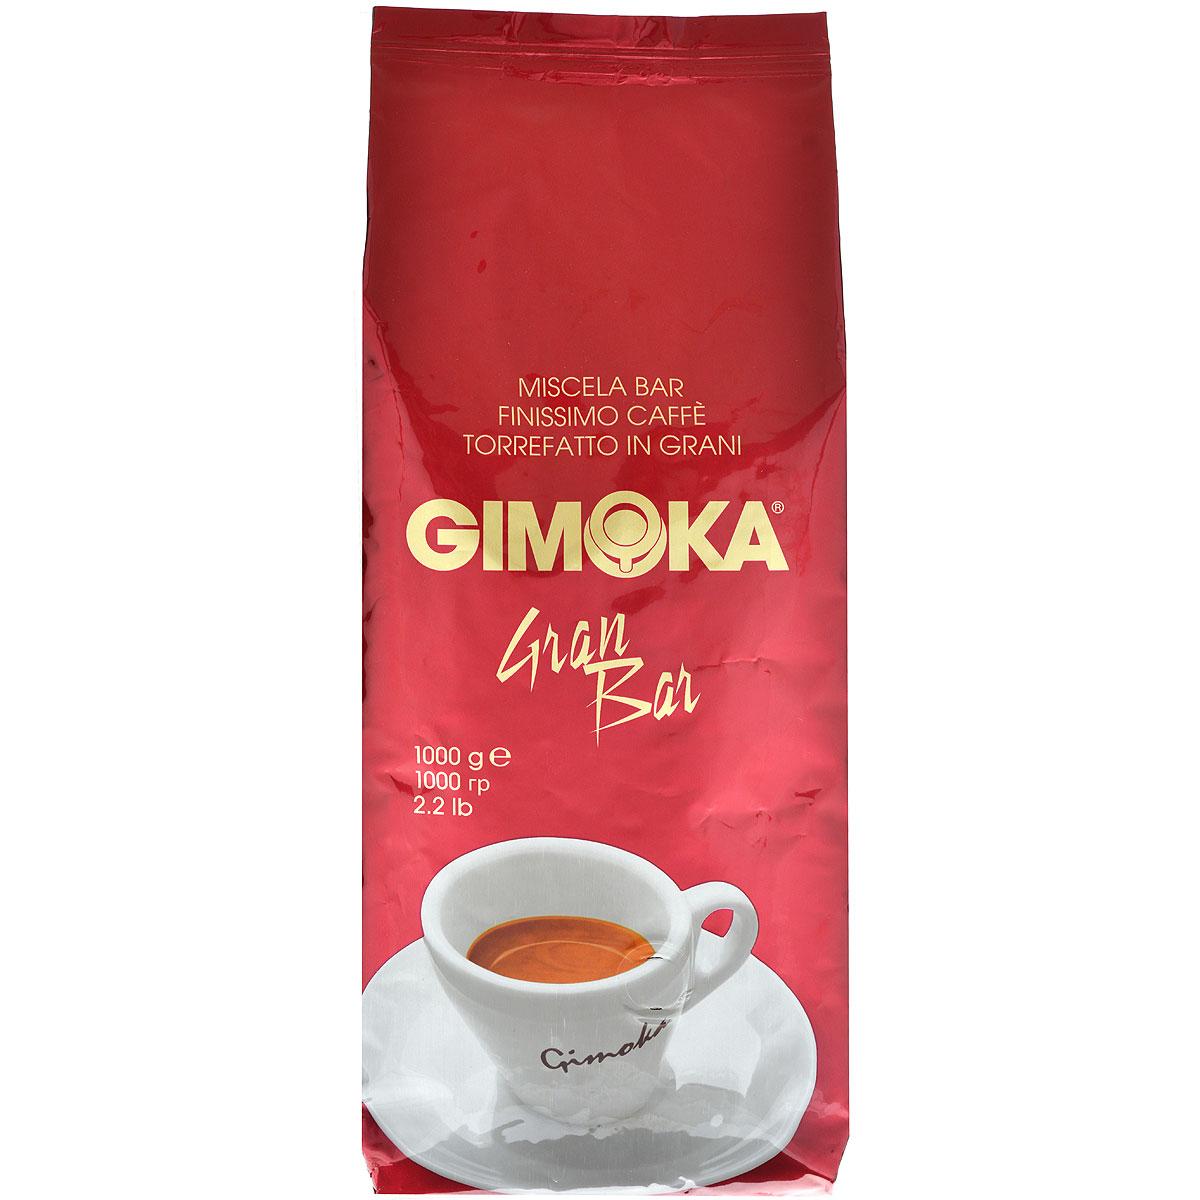 Gimoka Rossa Gran Bar кофе в зернах, 1 кг блузка moda rossa